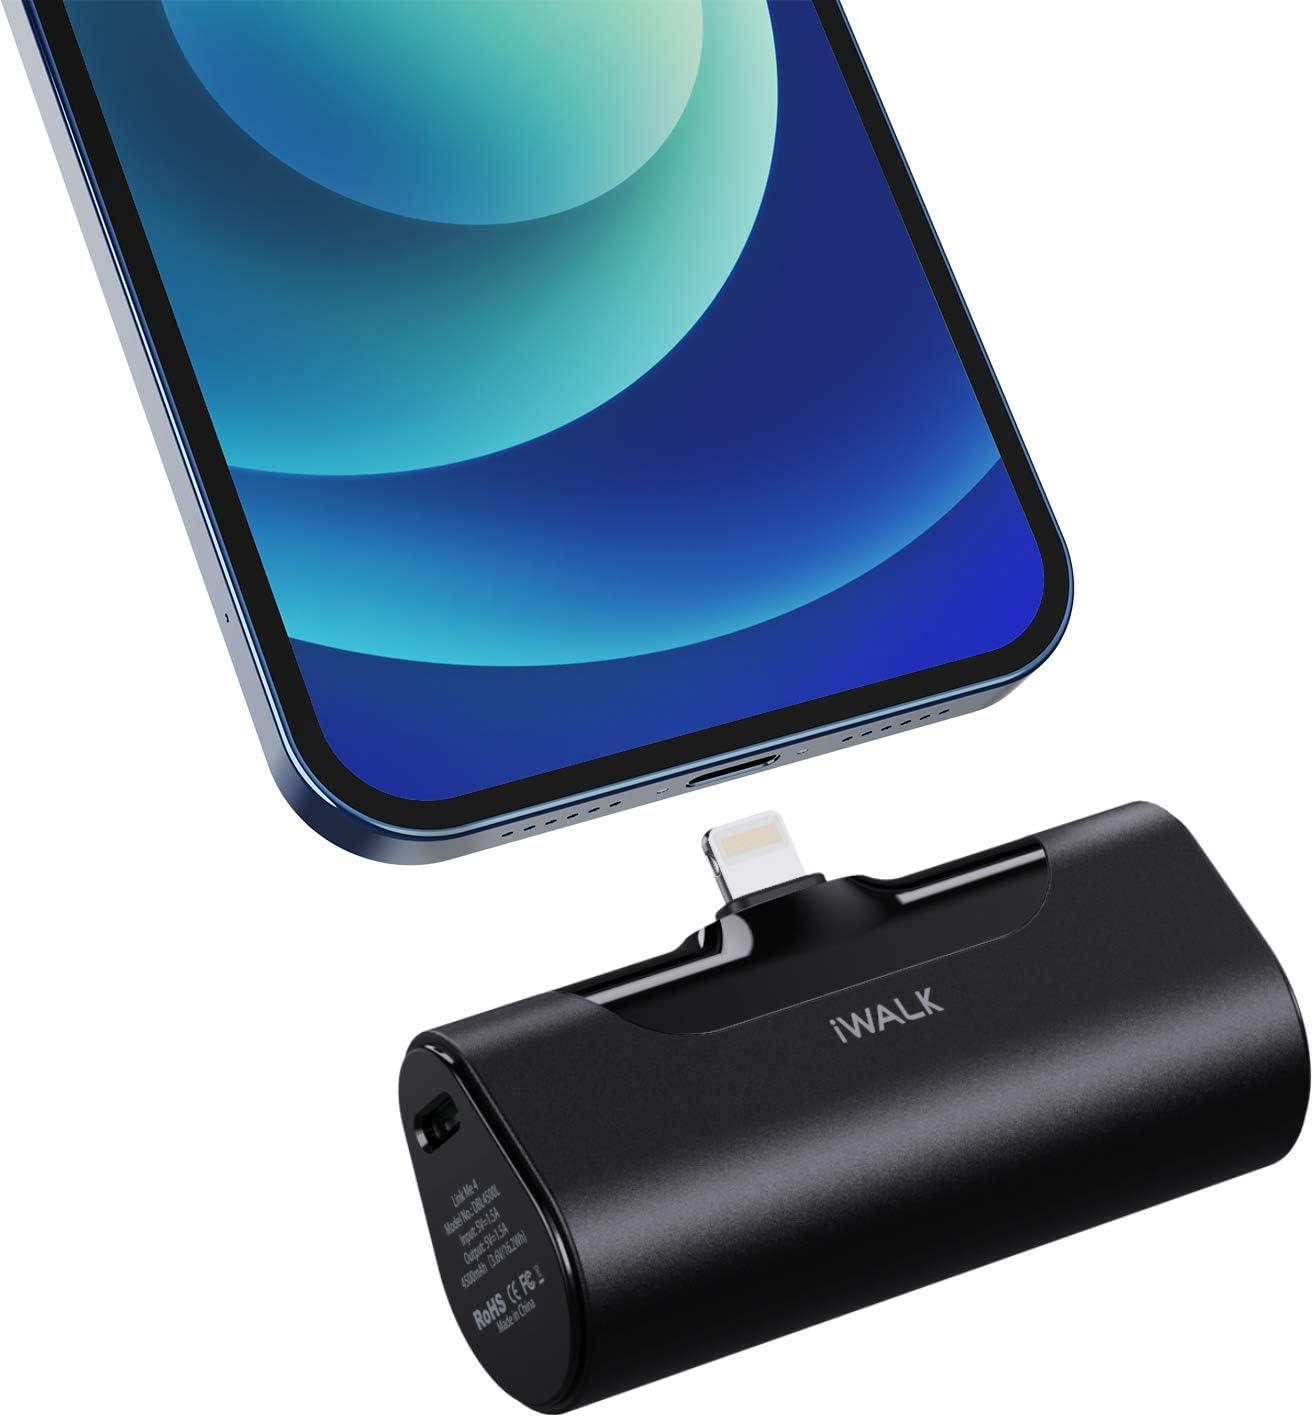 iWALK Small Power Bank 4500mAh Ultra-Compact Portable Charger Battery Black